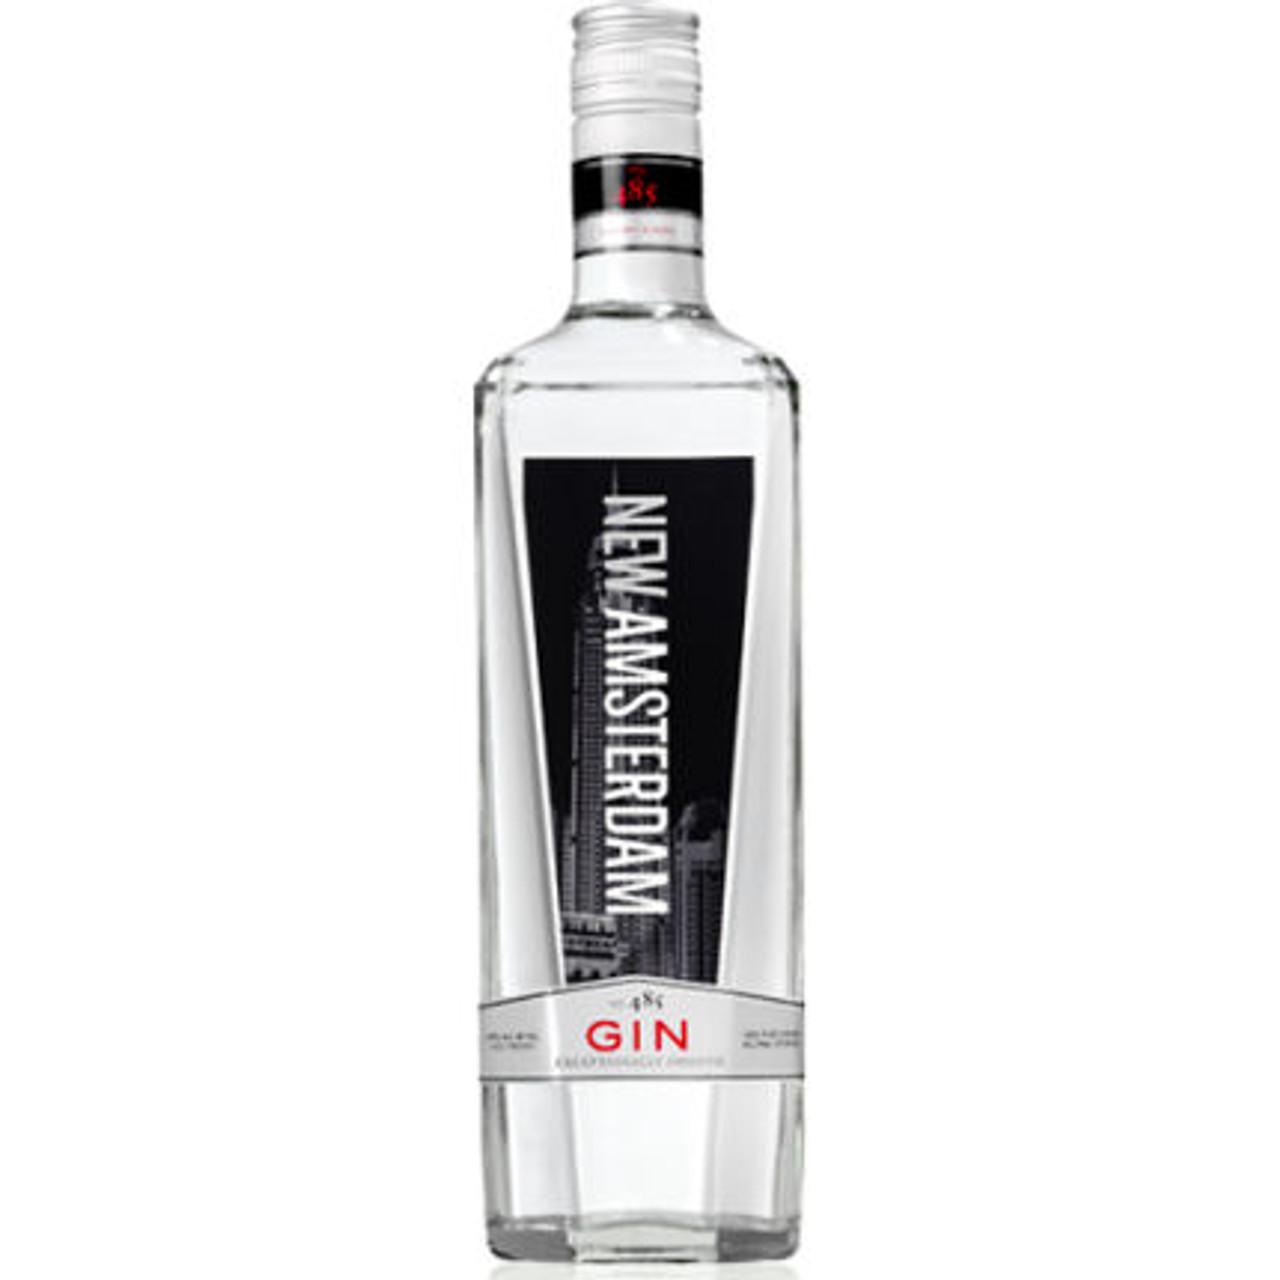 New Amsterdam Gin 750ml